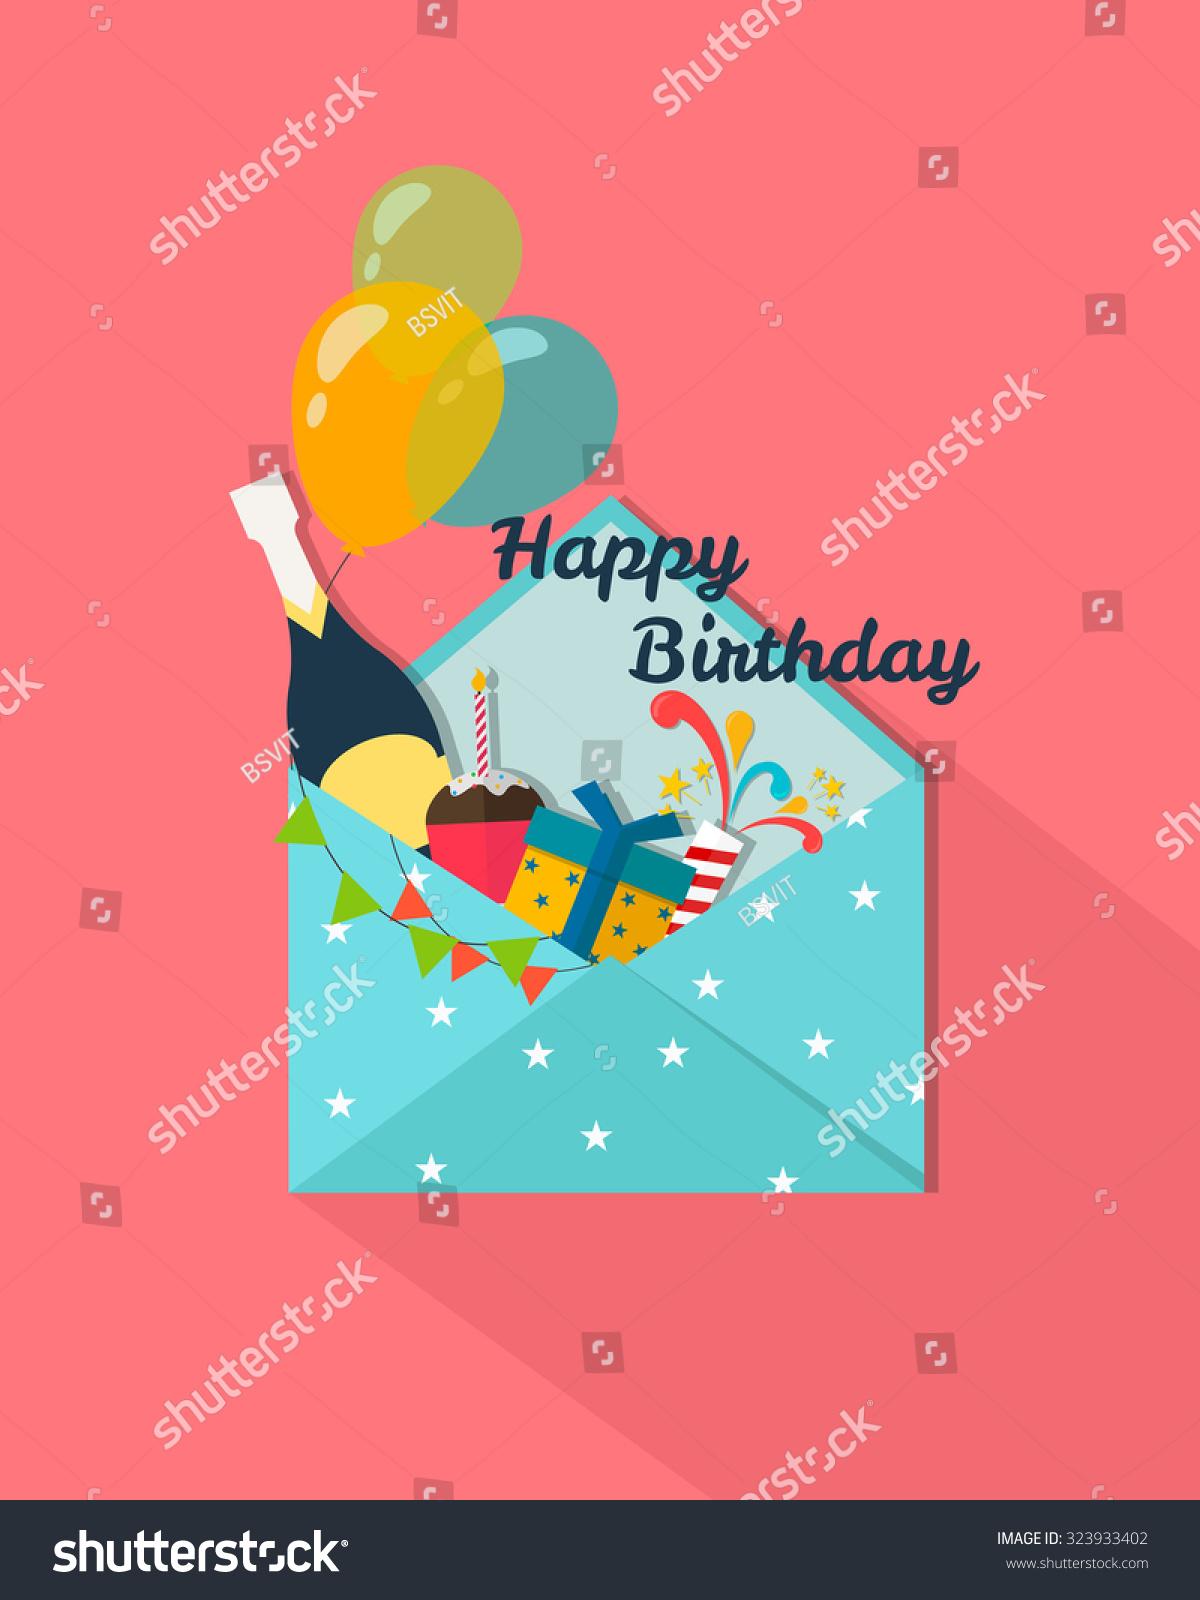 Happy Birthday Greeting CardPostal Envelopes With BalloonsCakeChampagneGift